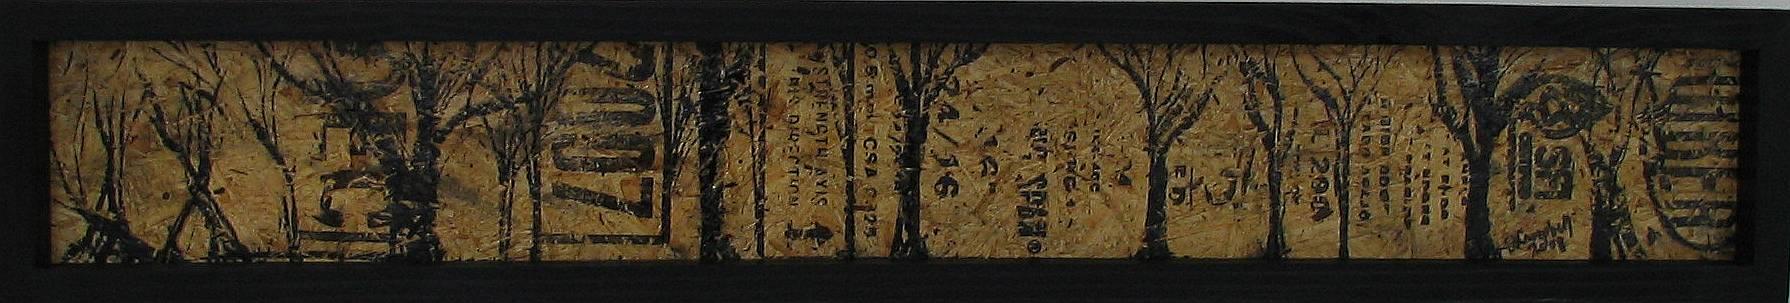 woodfortrees12aa